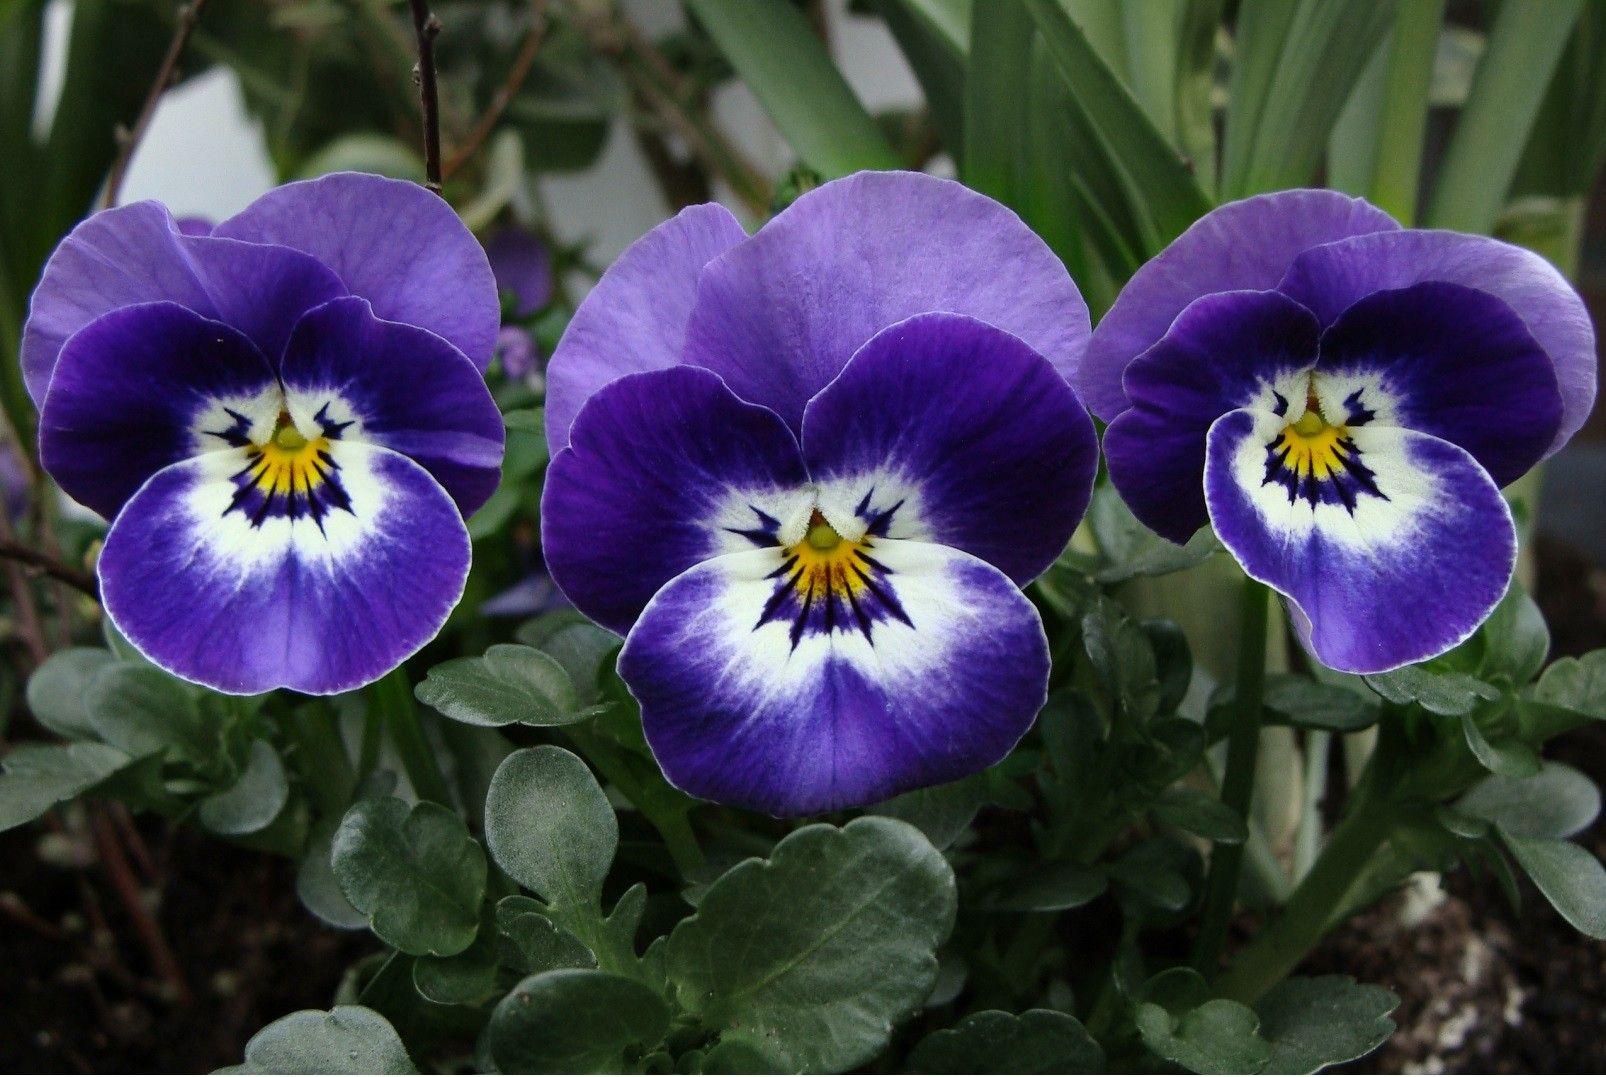 Blue White Pansies Flowers Pinterest Flowers Flower And Gardens